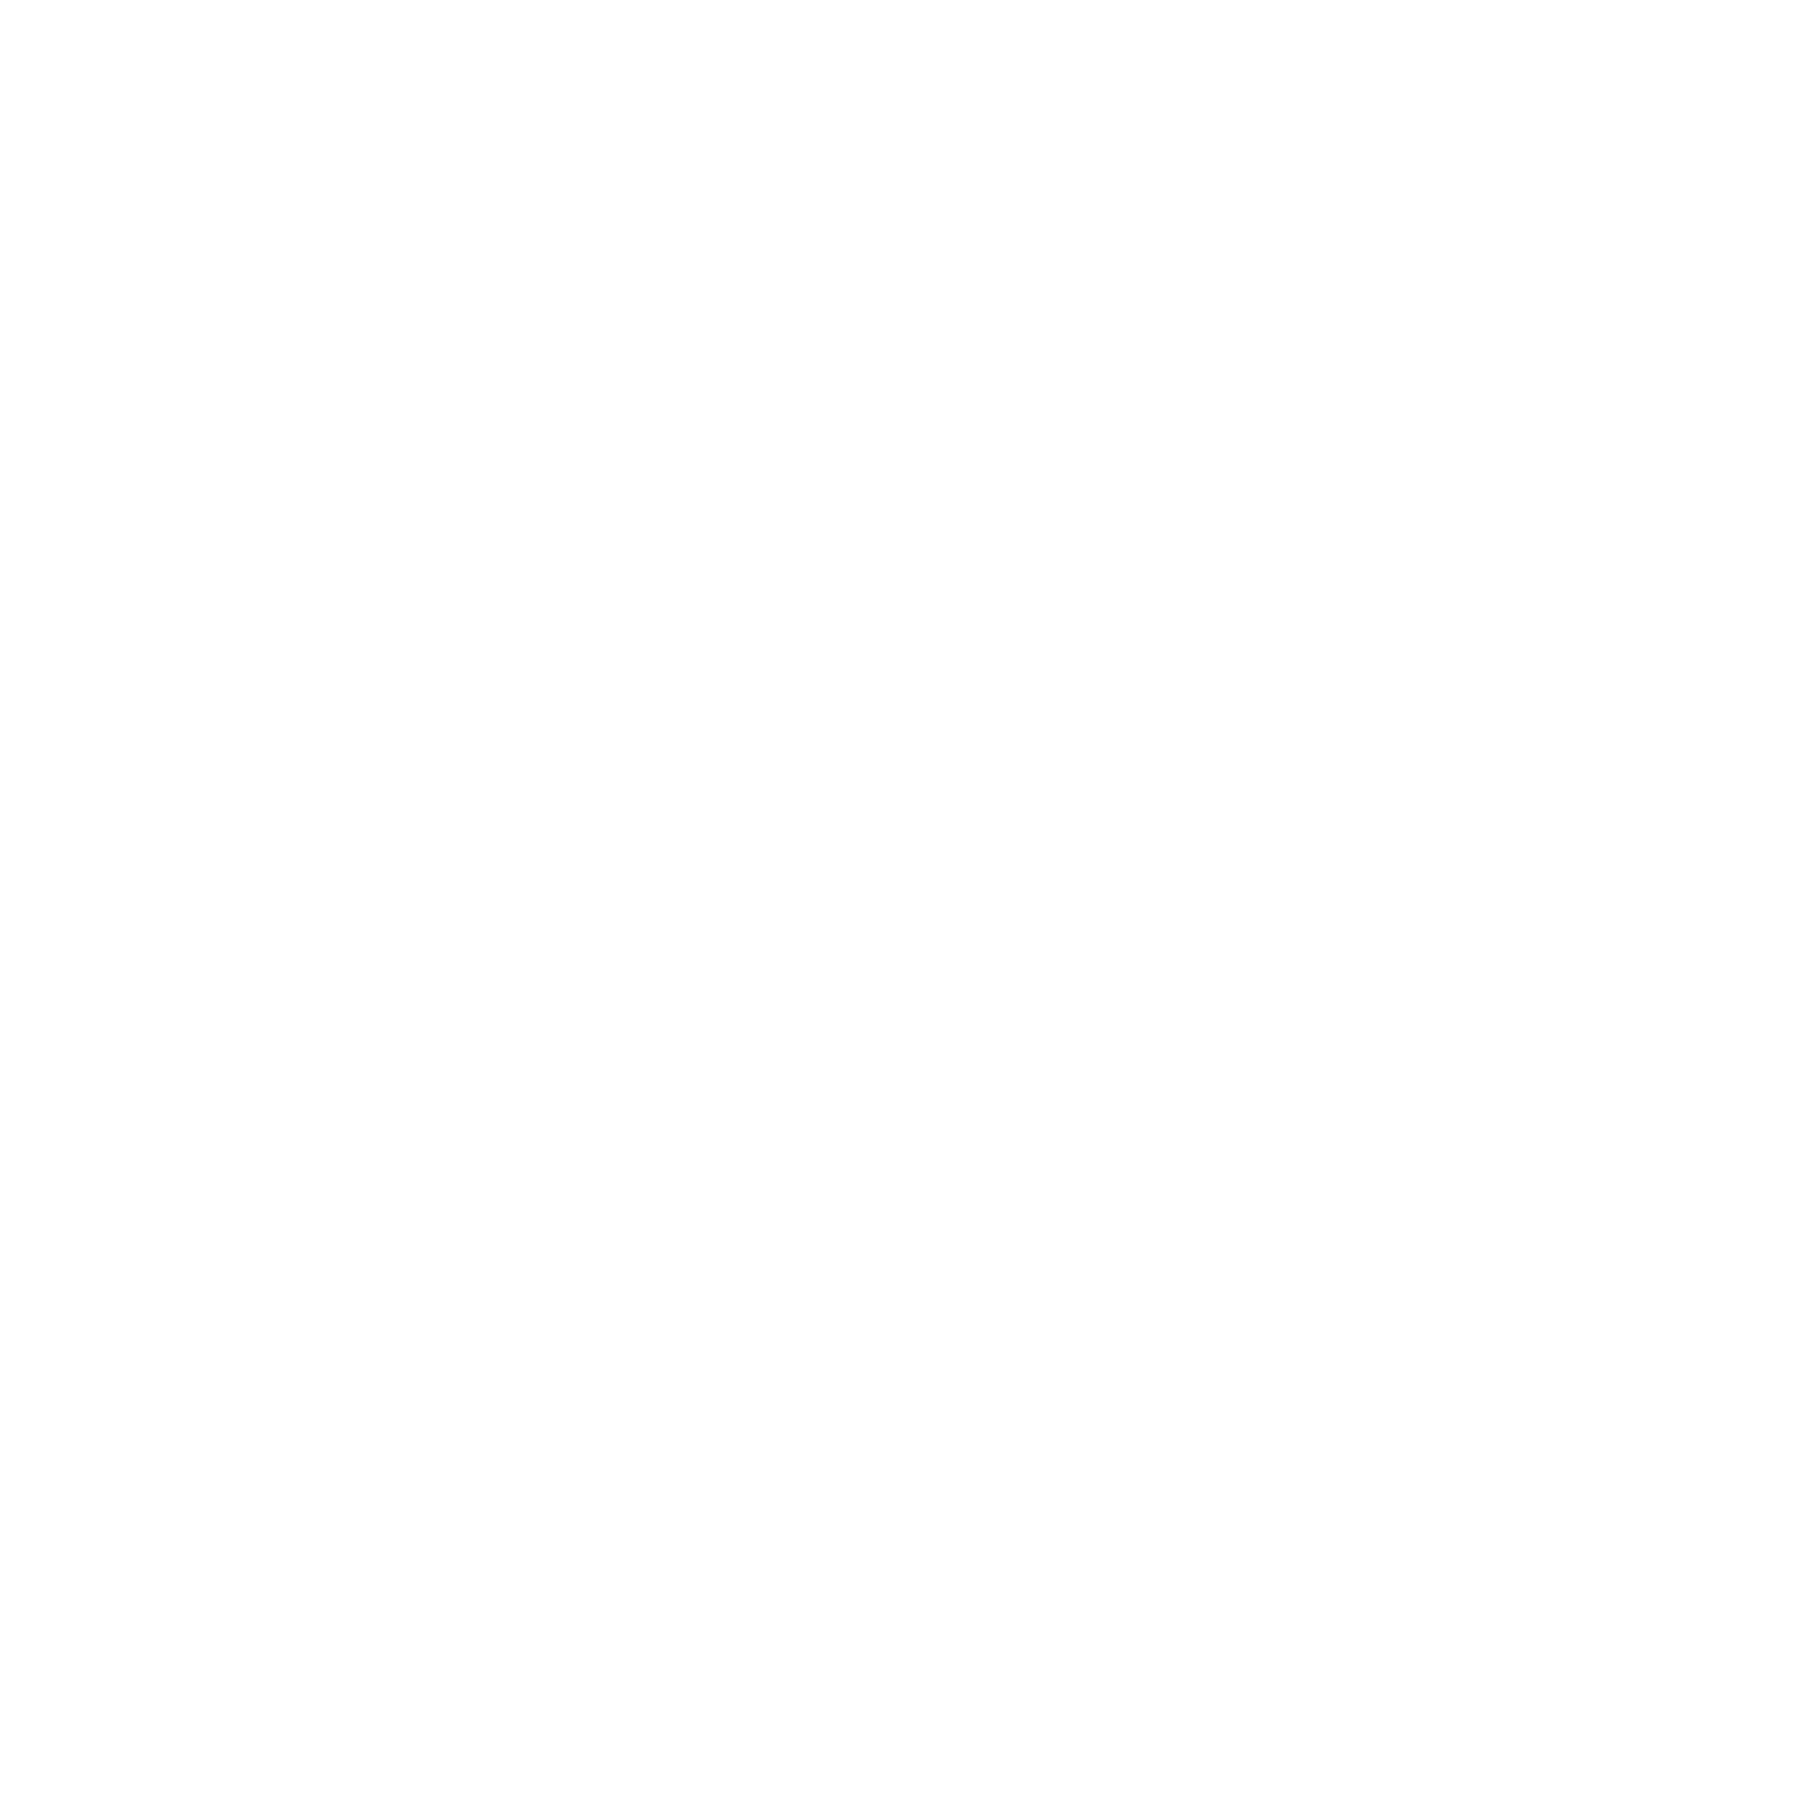 logo_PD_white_square